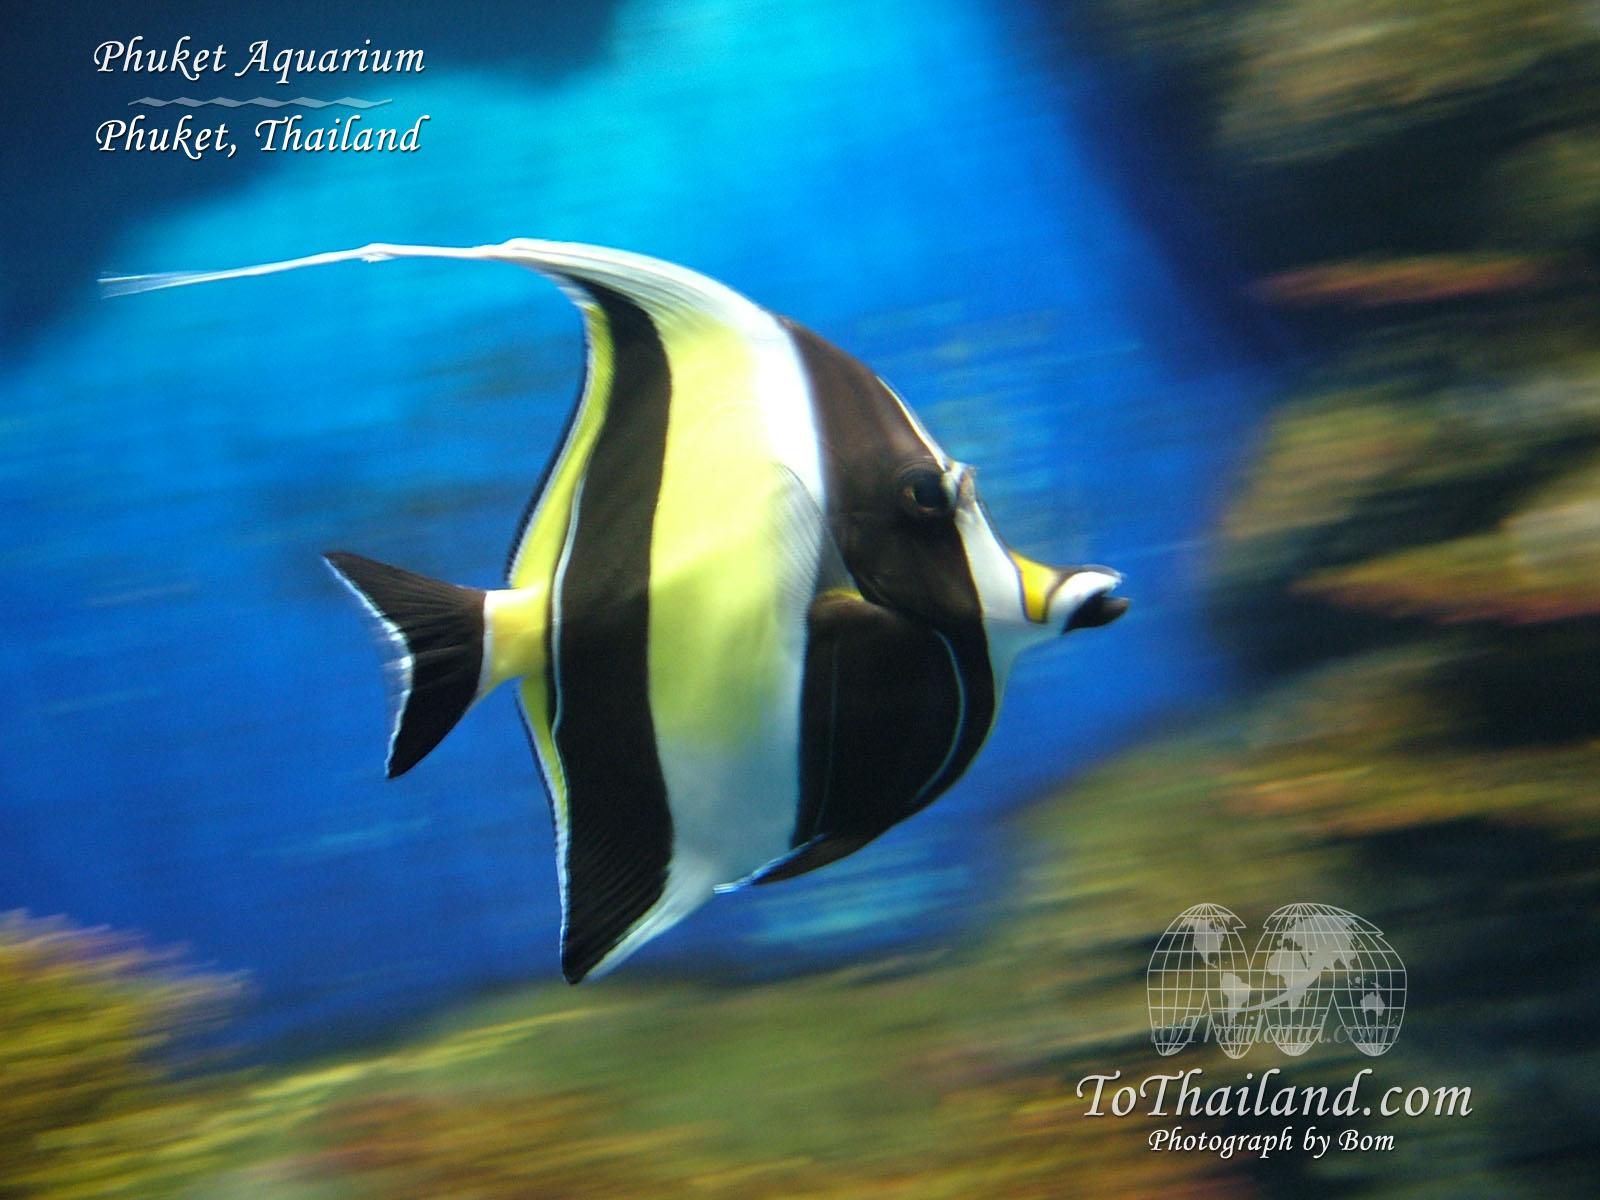 Phuket thailand wallpaper desinow 39 s blog for Jb tropical fish